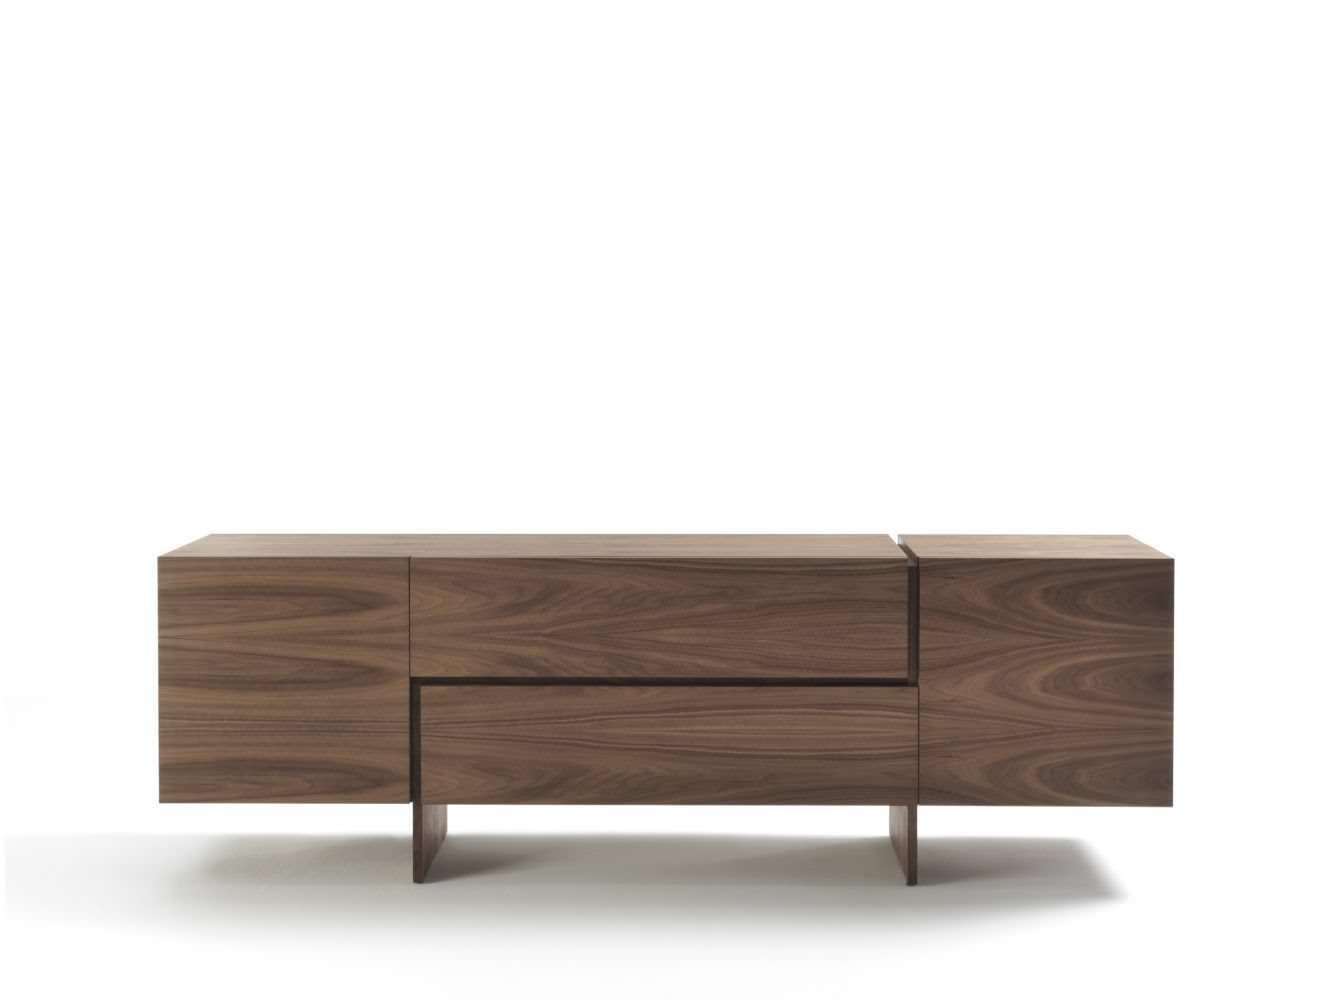 amazing excellent perfect wei hochglanz nussbaum sideboard nussbaum pinterest source sideboard solid wood aki by bartoli design riva with sideboard wei